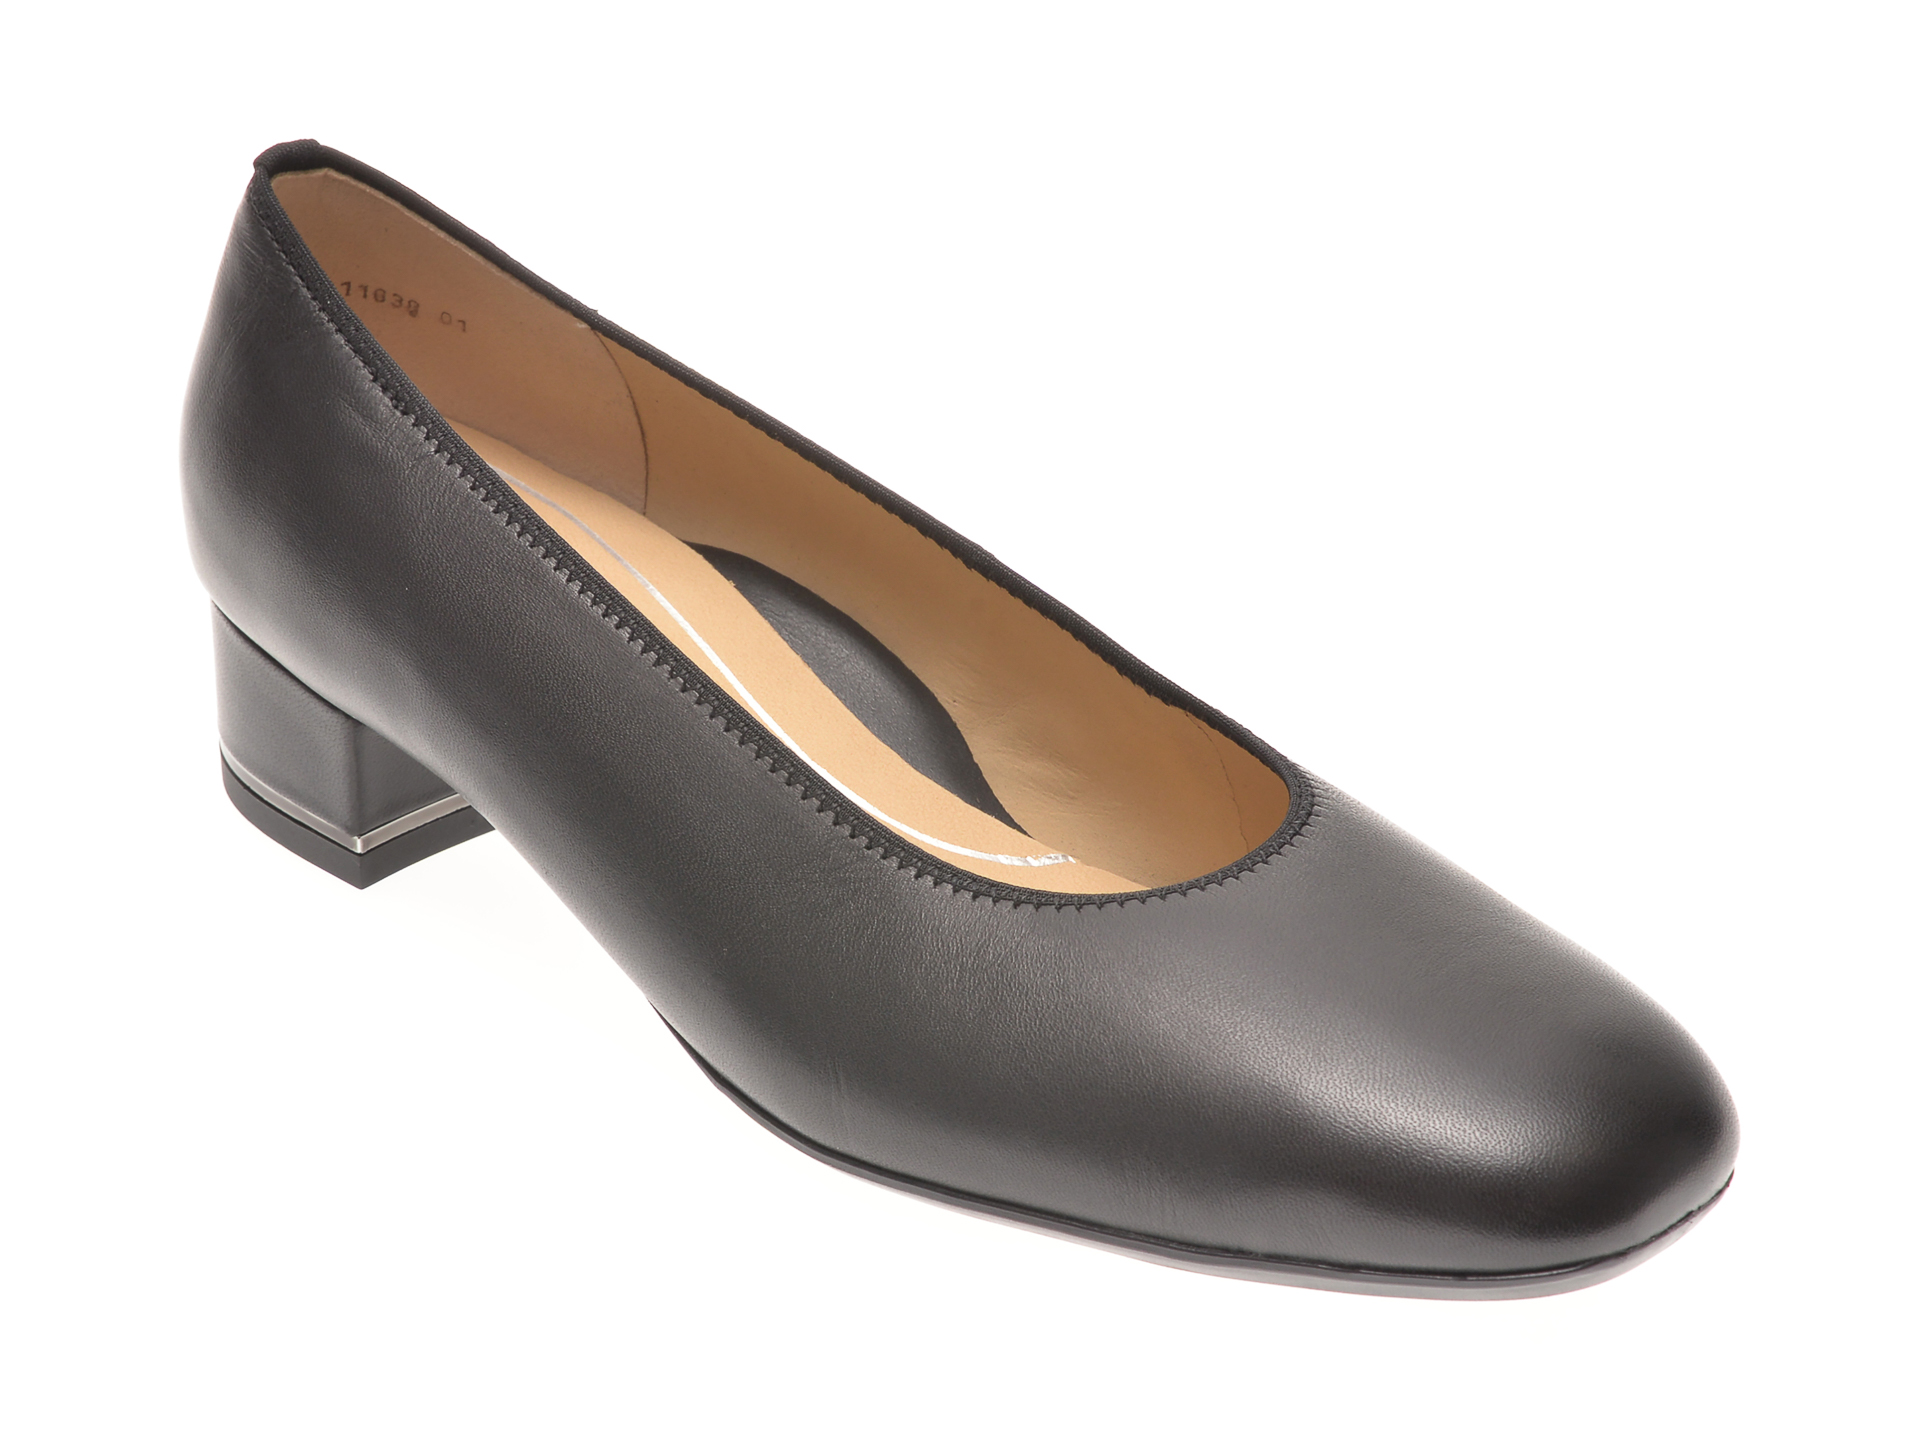 Pantofi ARA negri, 11838, din piele naturala New